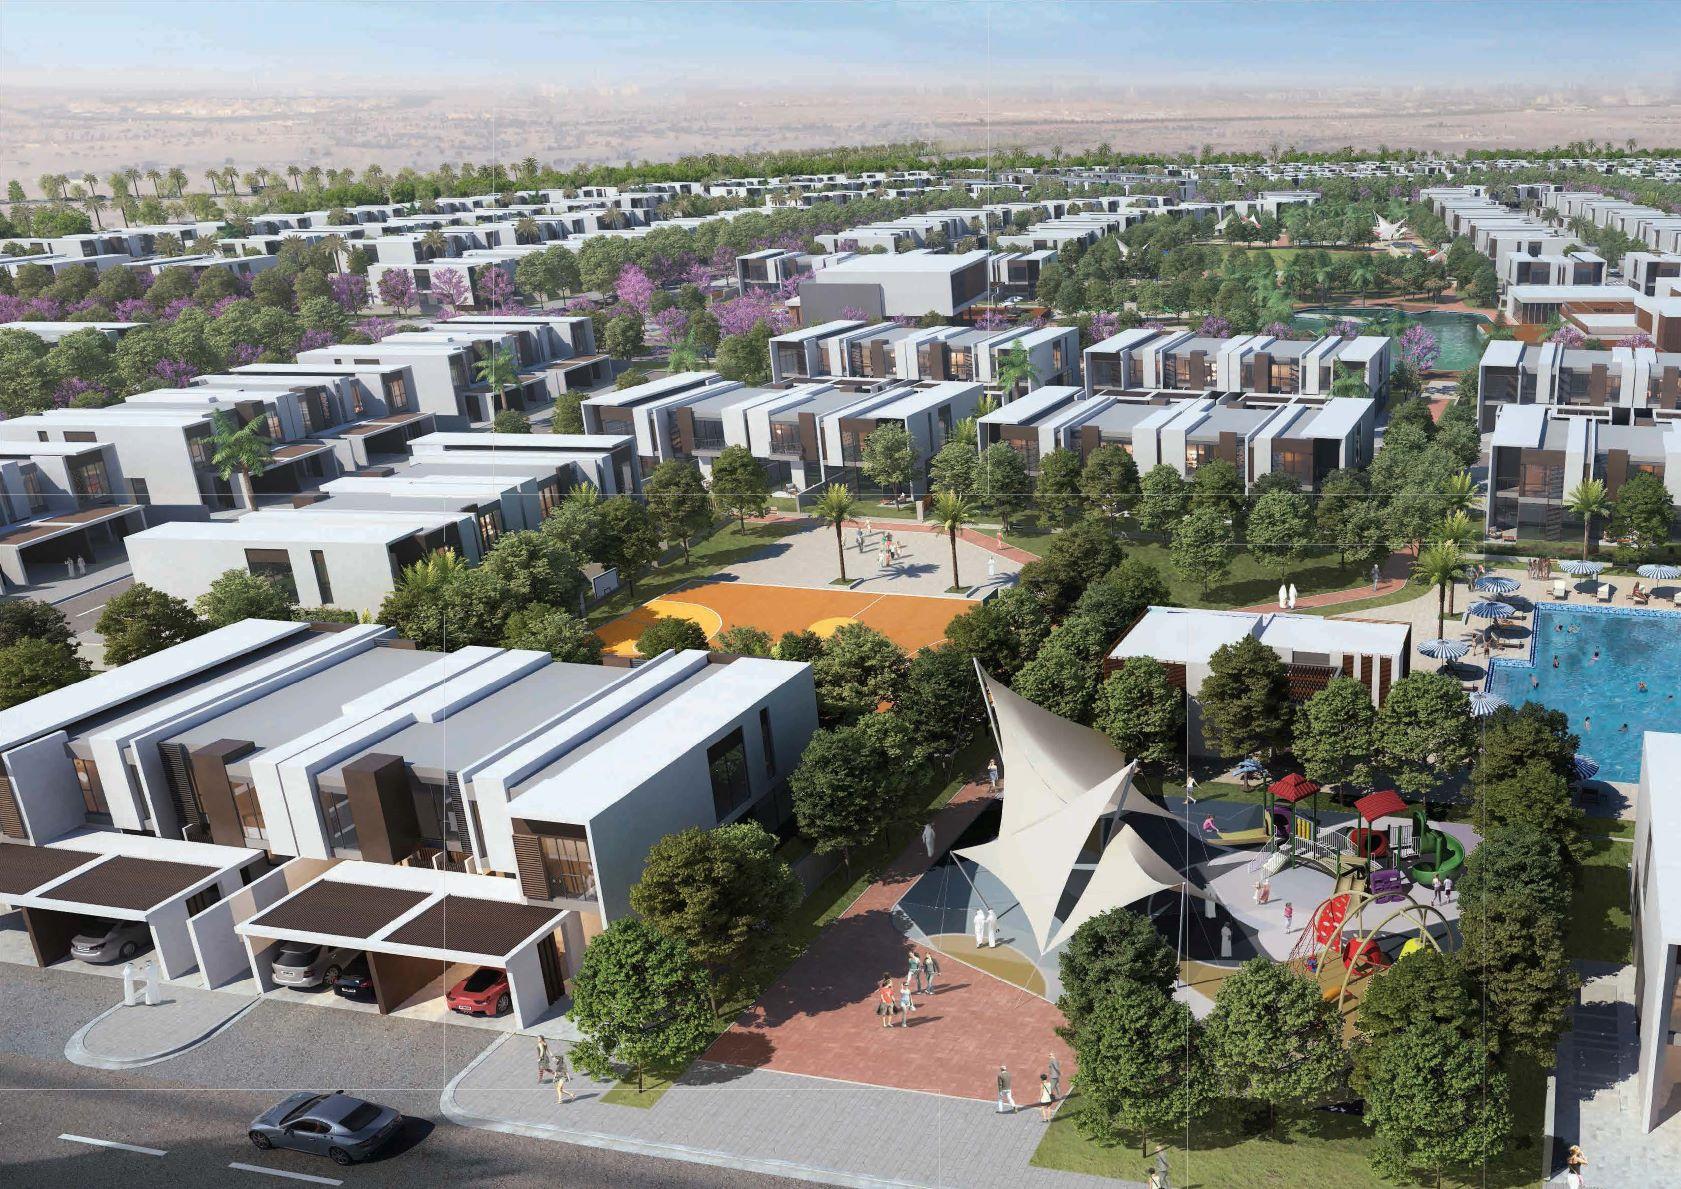 Home | Ali Mousa Holding